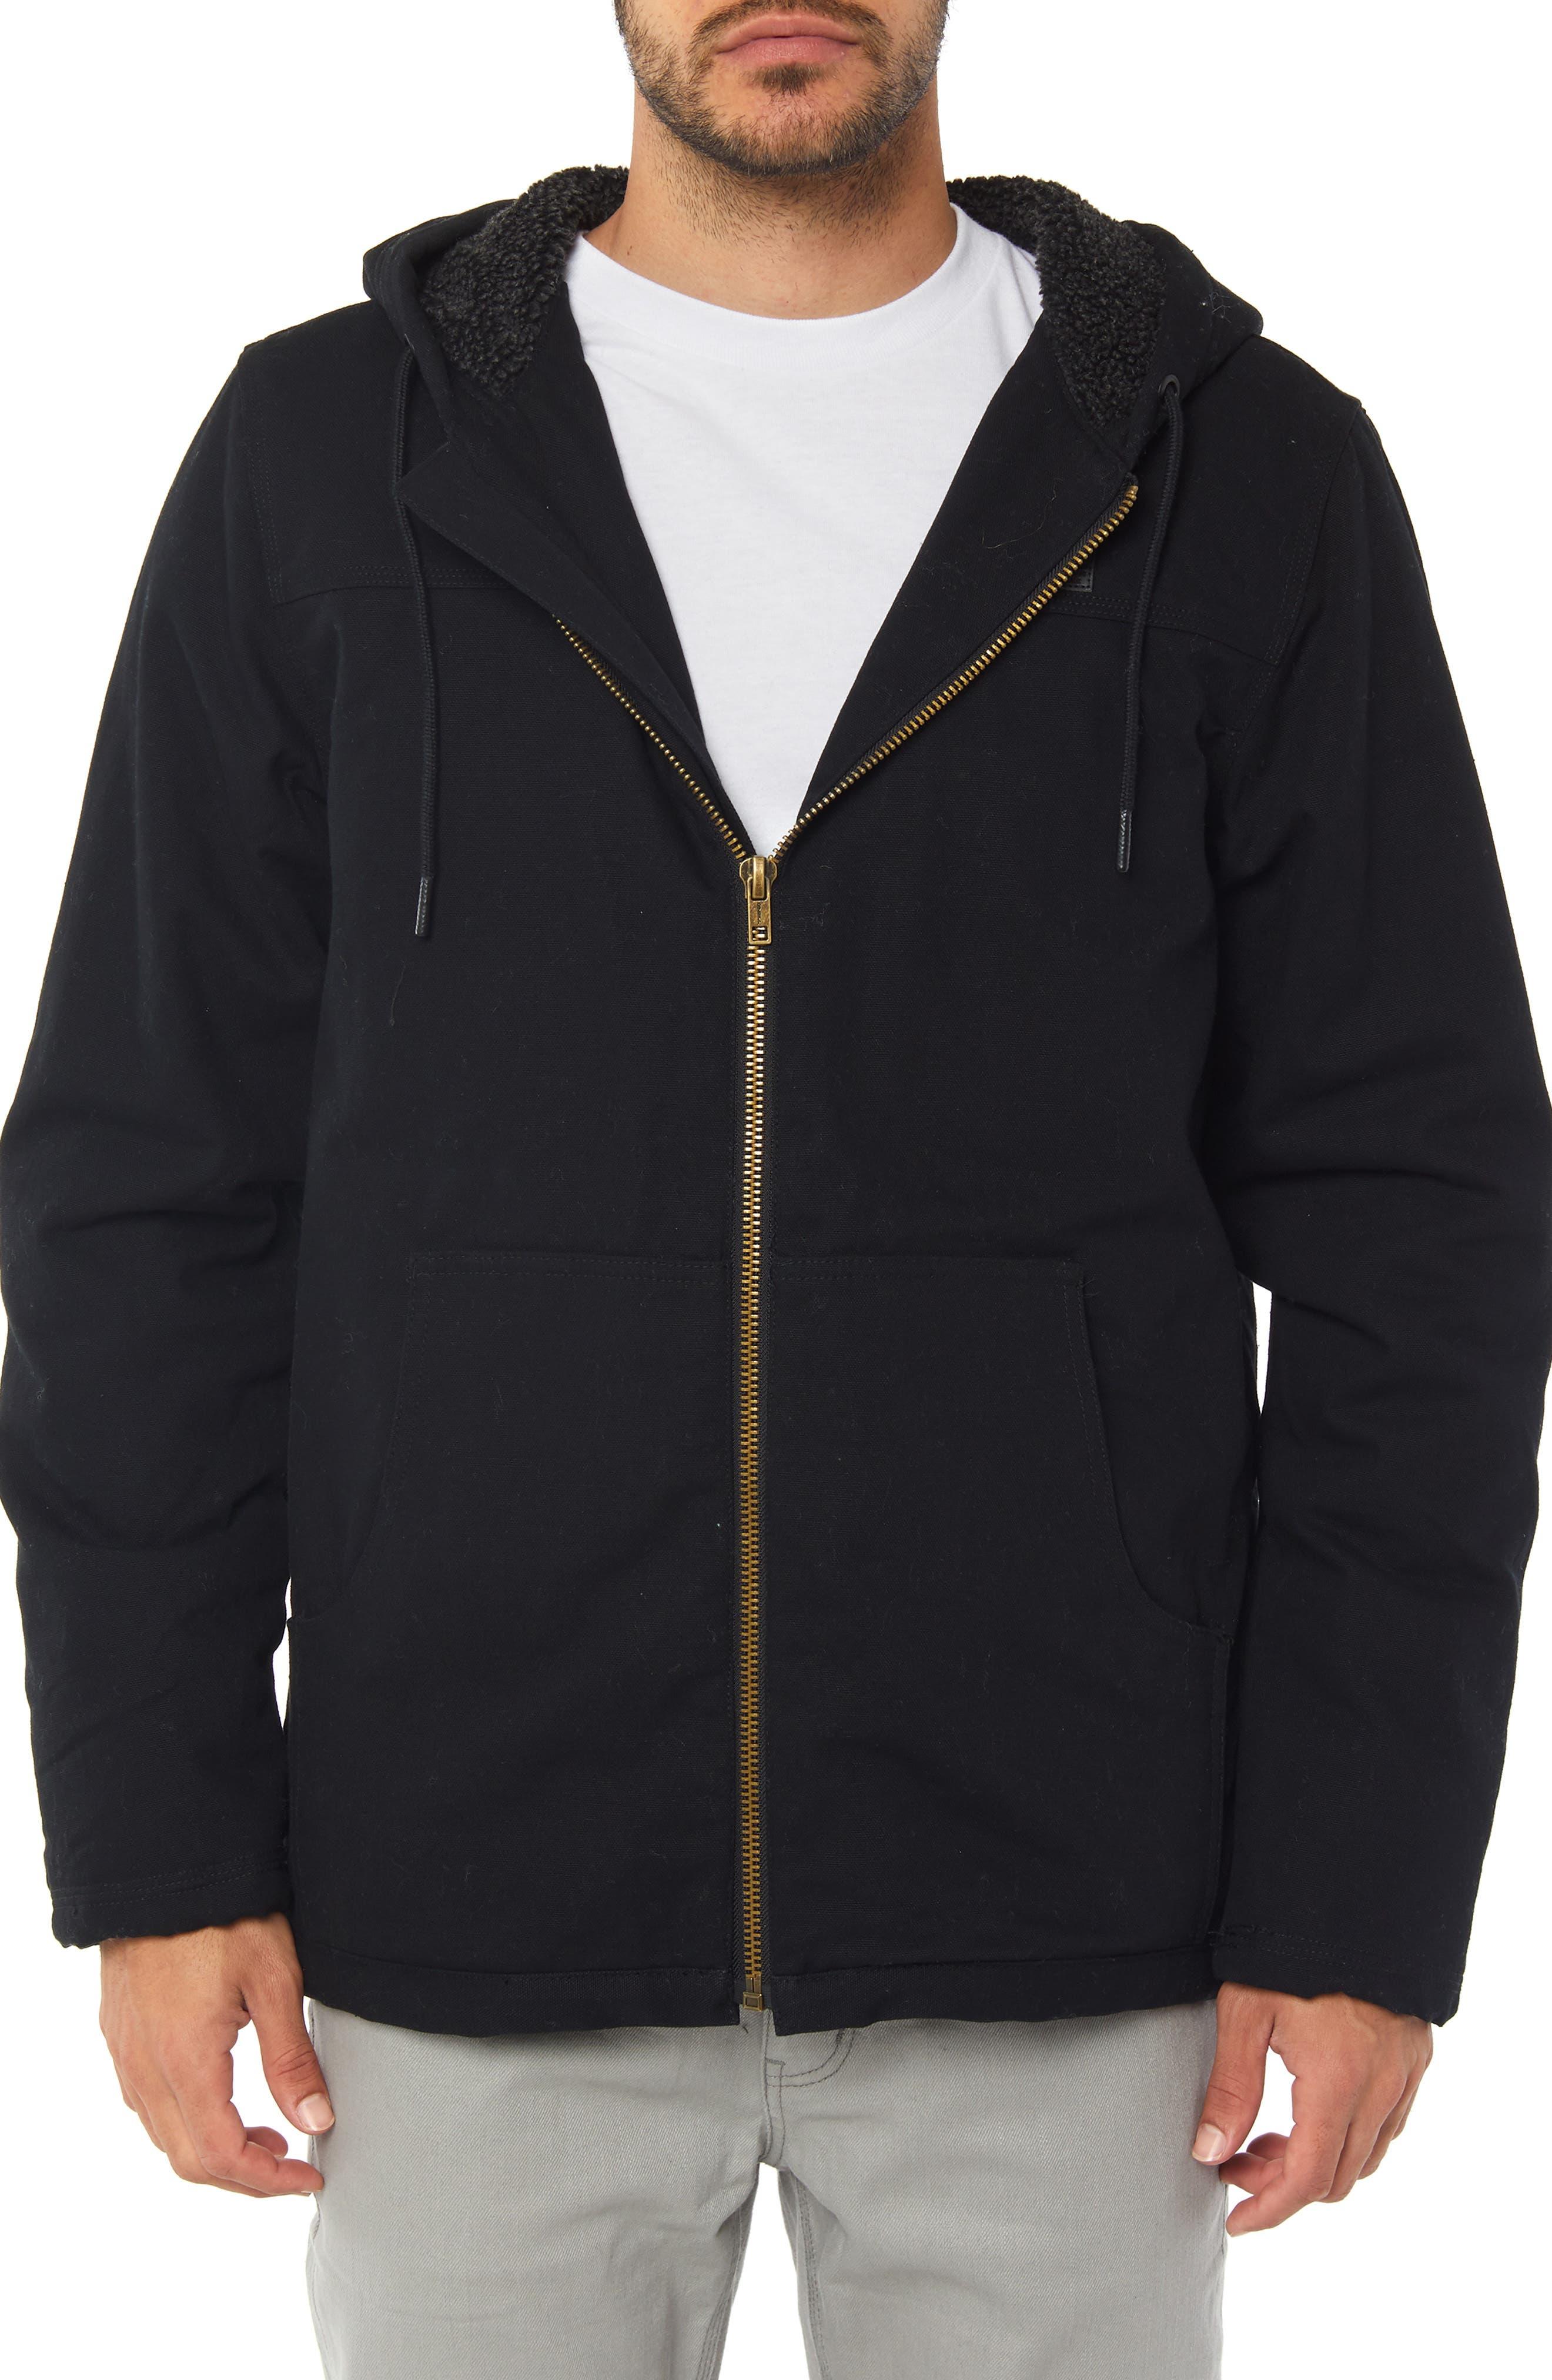 Detroit Jacket,                             Main thumbnail 1, color,                             BLACK